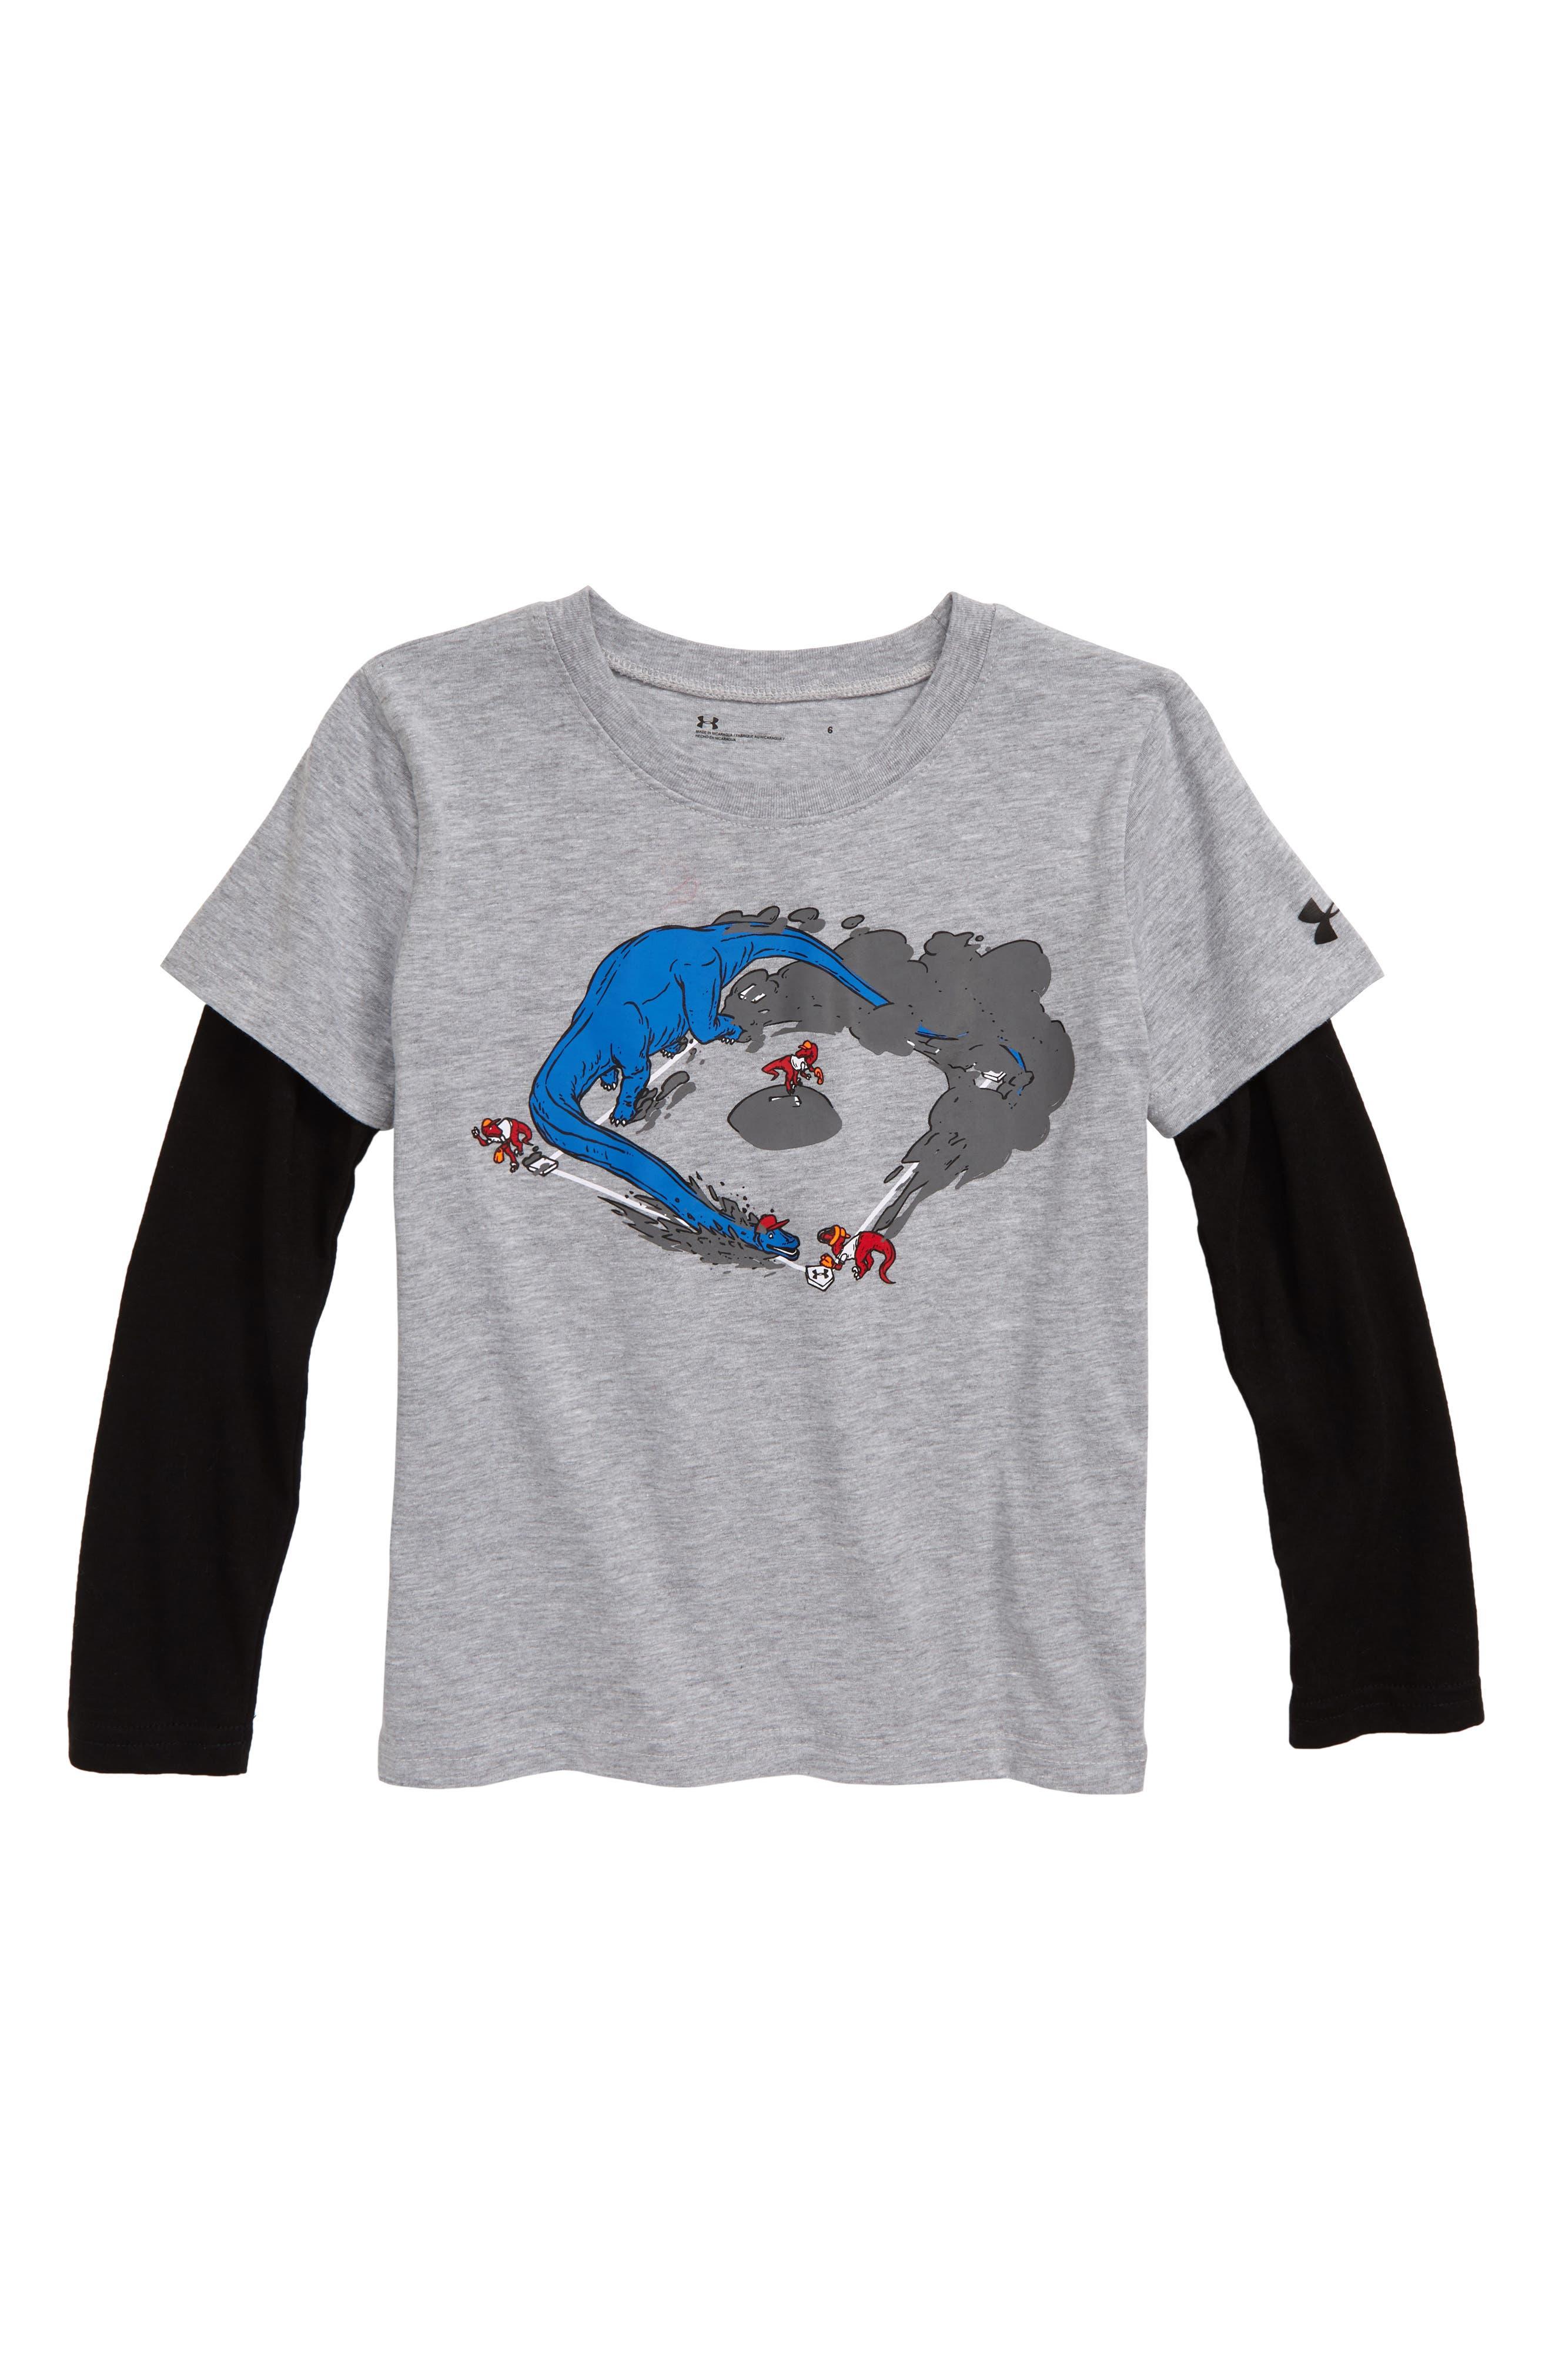 Toddler Boys Under Armour Bronto Base Slider Shirt Size 3T  Grey